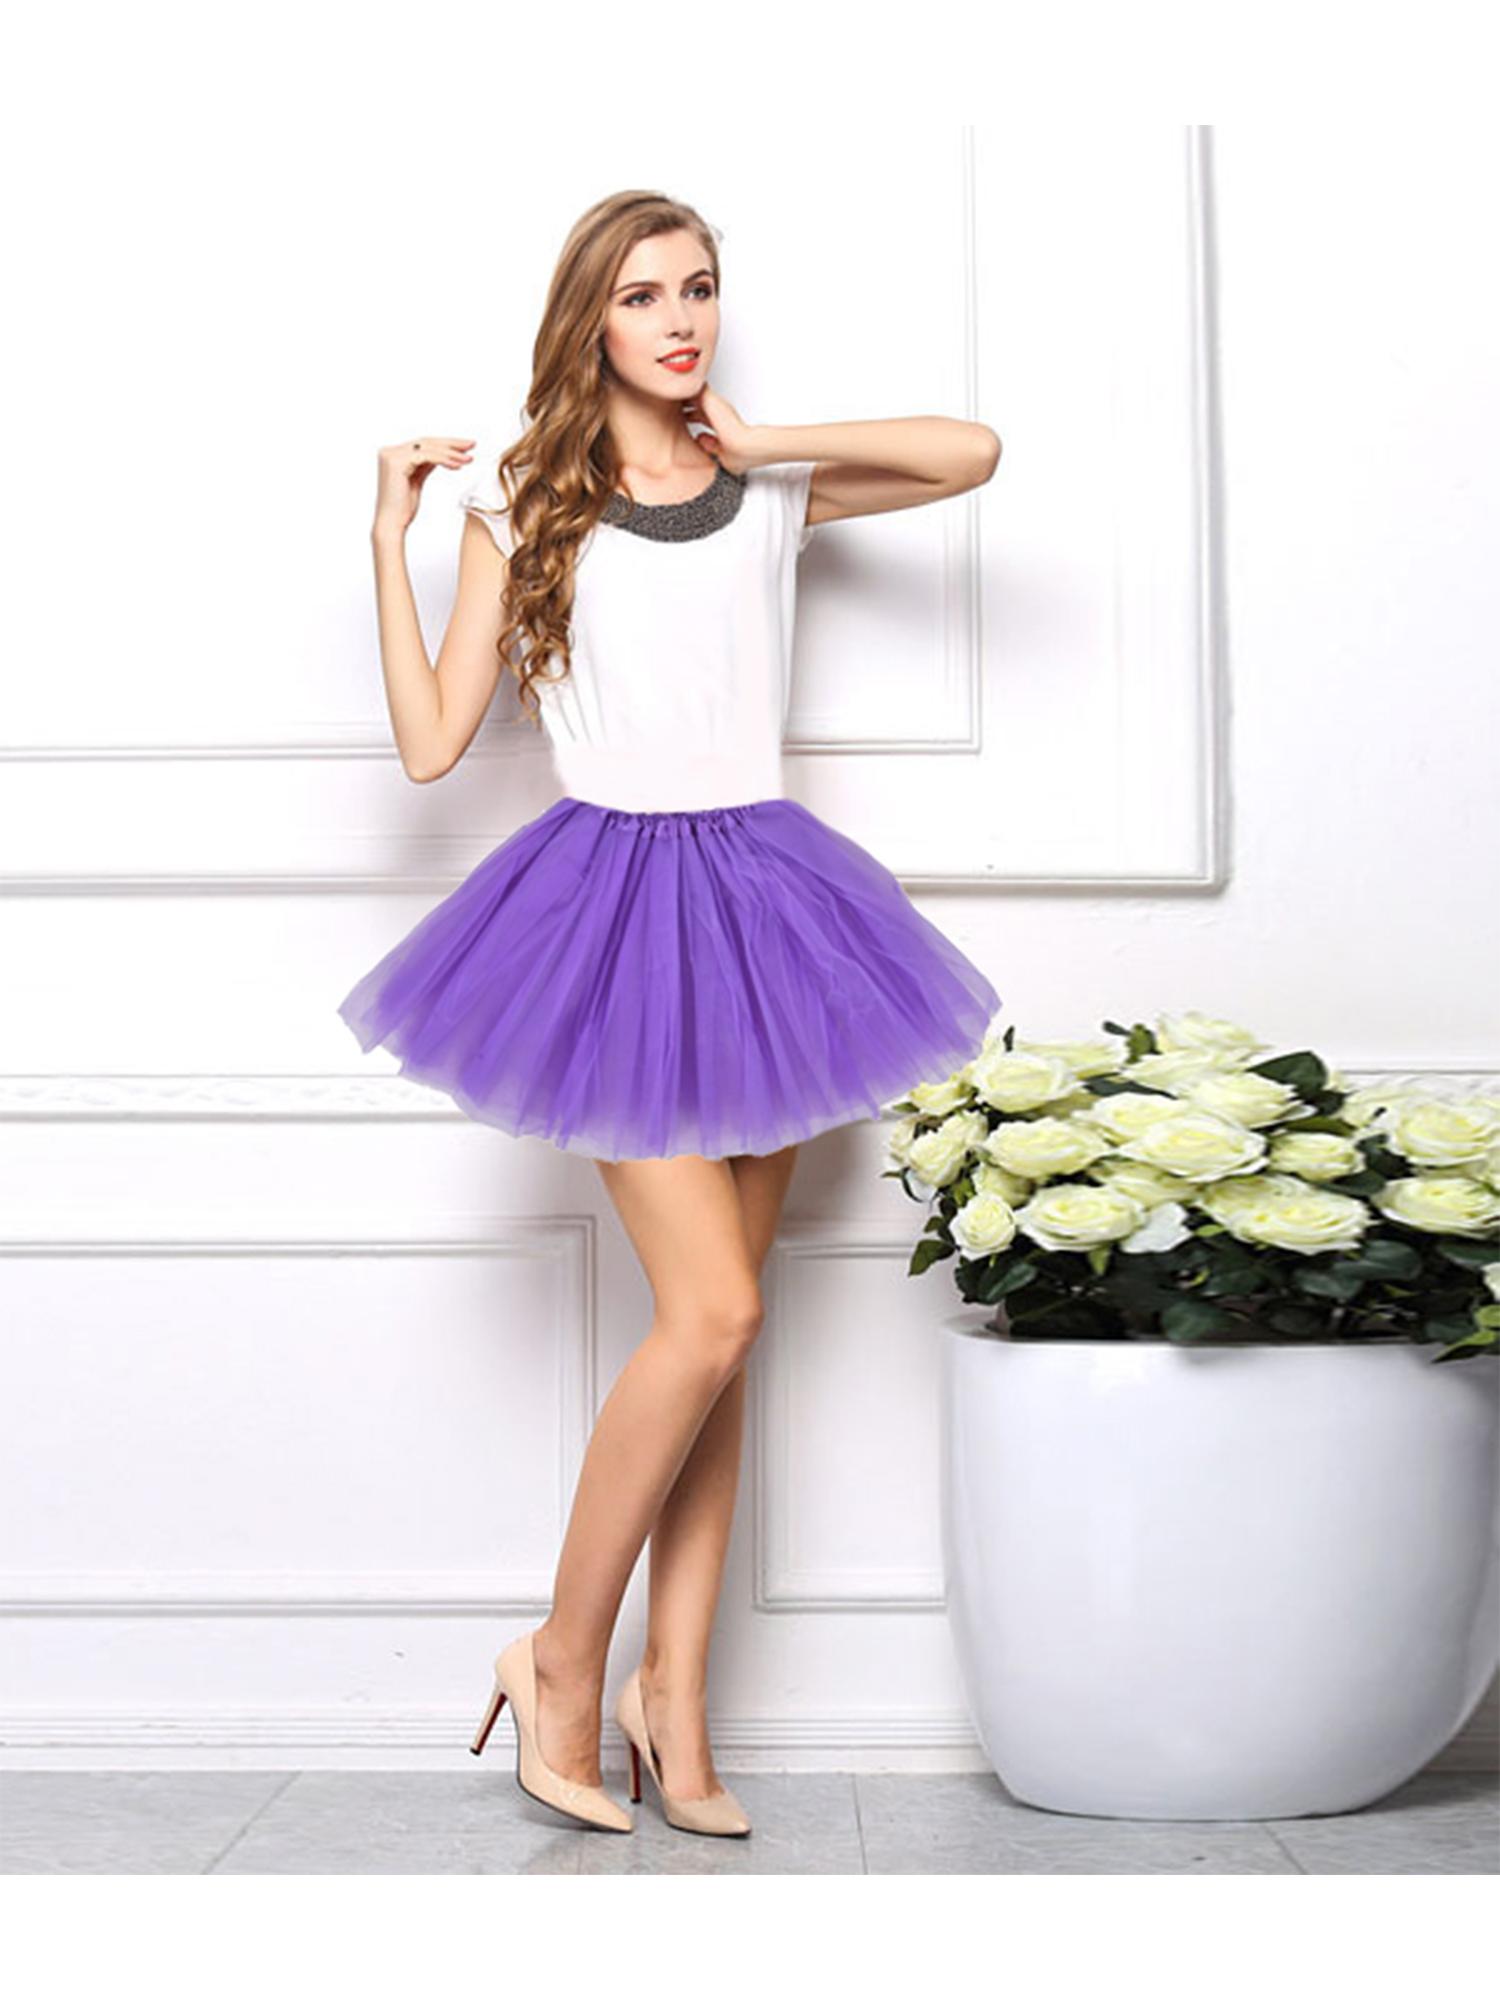 Mardi gras tulle tutu skirt hi low three tier purple green yellow adult carnival